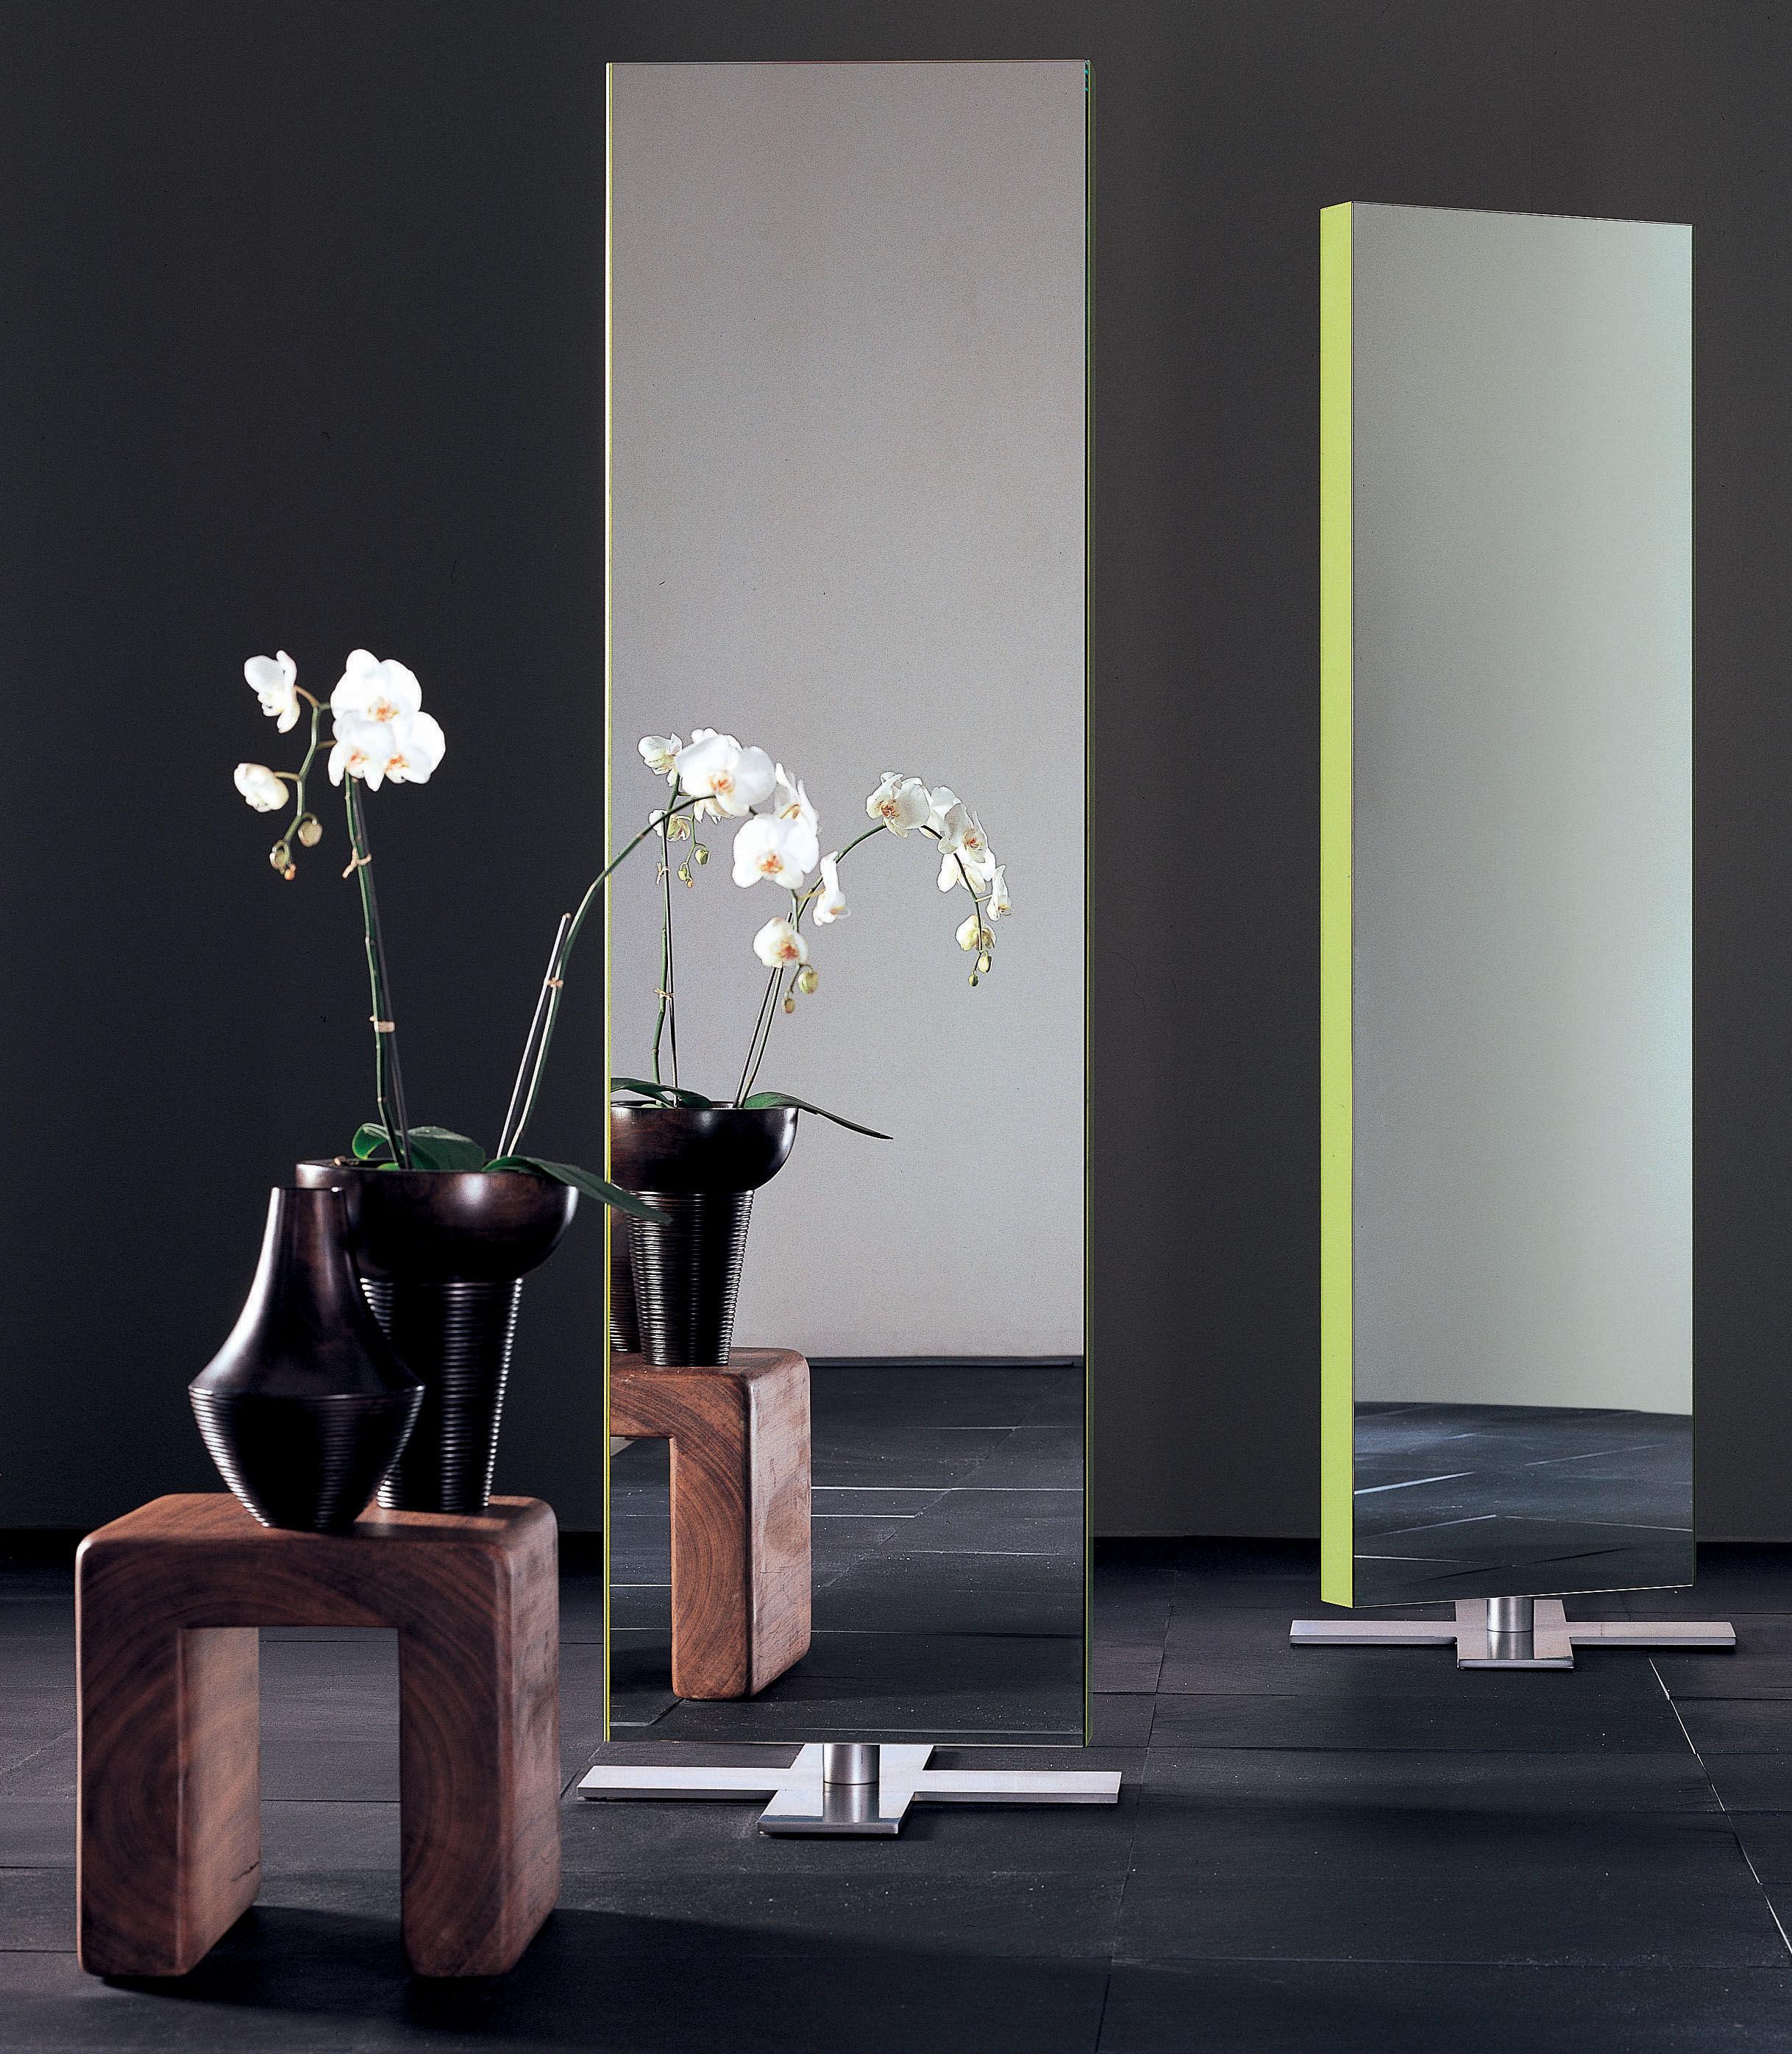 Miroir giano poser au sol l 50 x h 180 cm laqu - Grand miroir a poser au sol ...